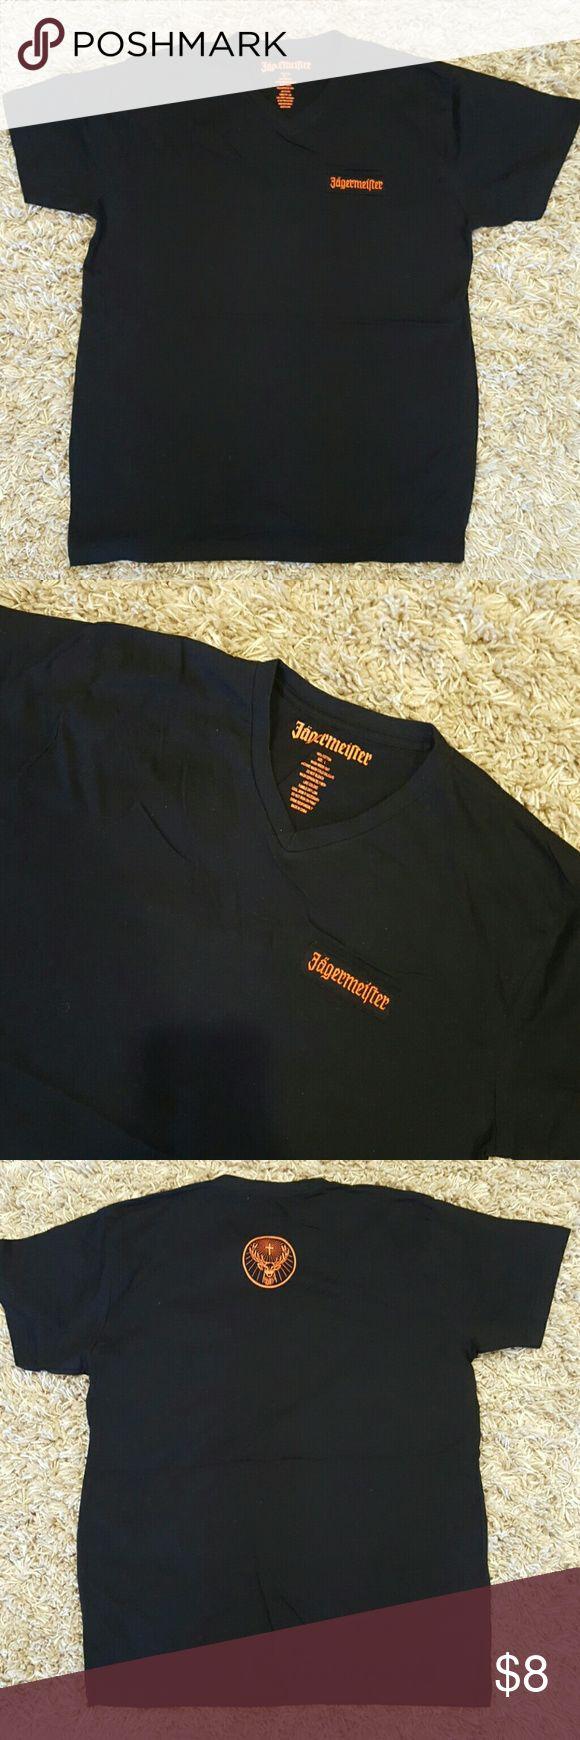 NWOT Men's Jägermeister tee Men's Jägermeister tee, size large. New without tags, never worn. Shirts Tees - Short Sleeve